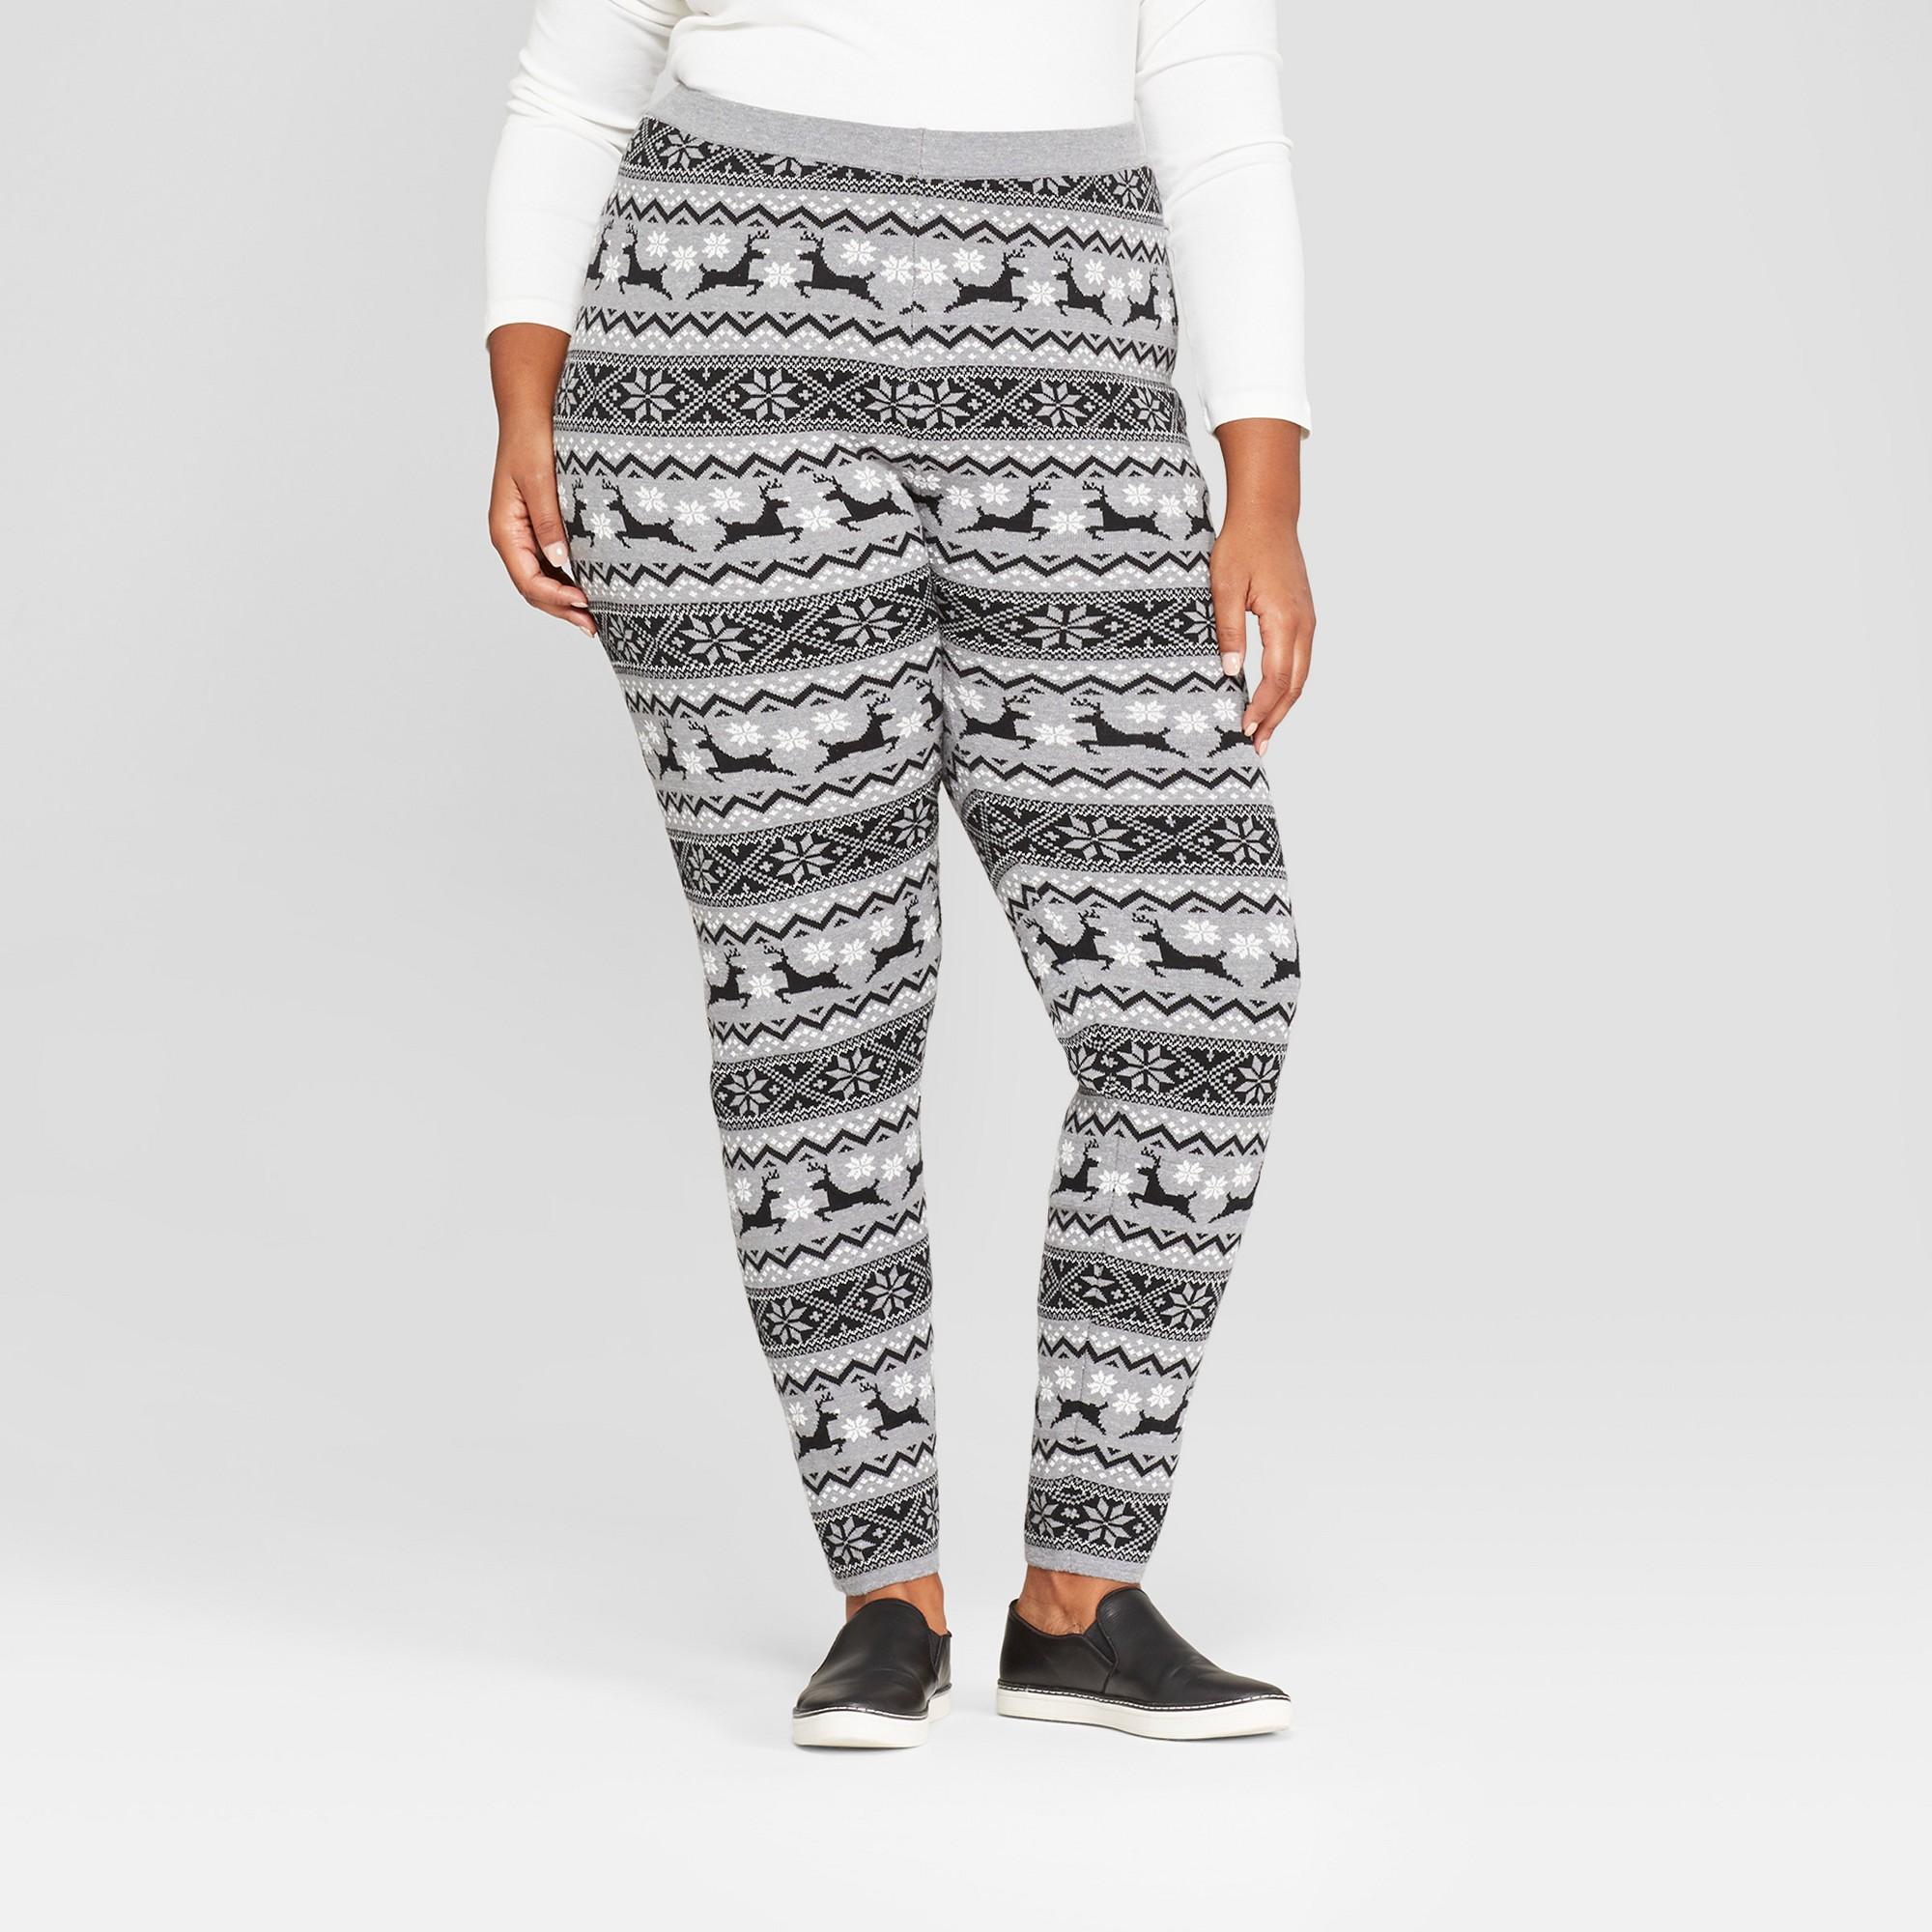 a83479a20042e Women's Plus Size Christmas Reindeer Sweater Leggings - 33 Degrees  (Juniors') Gray 2X